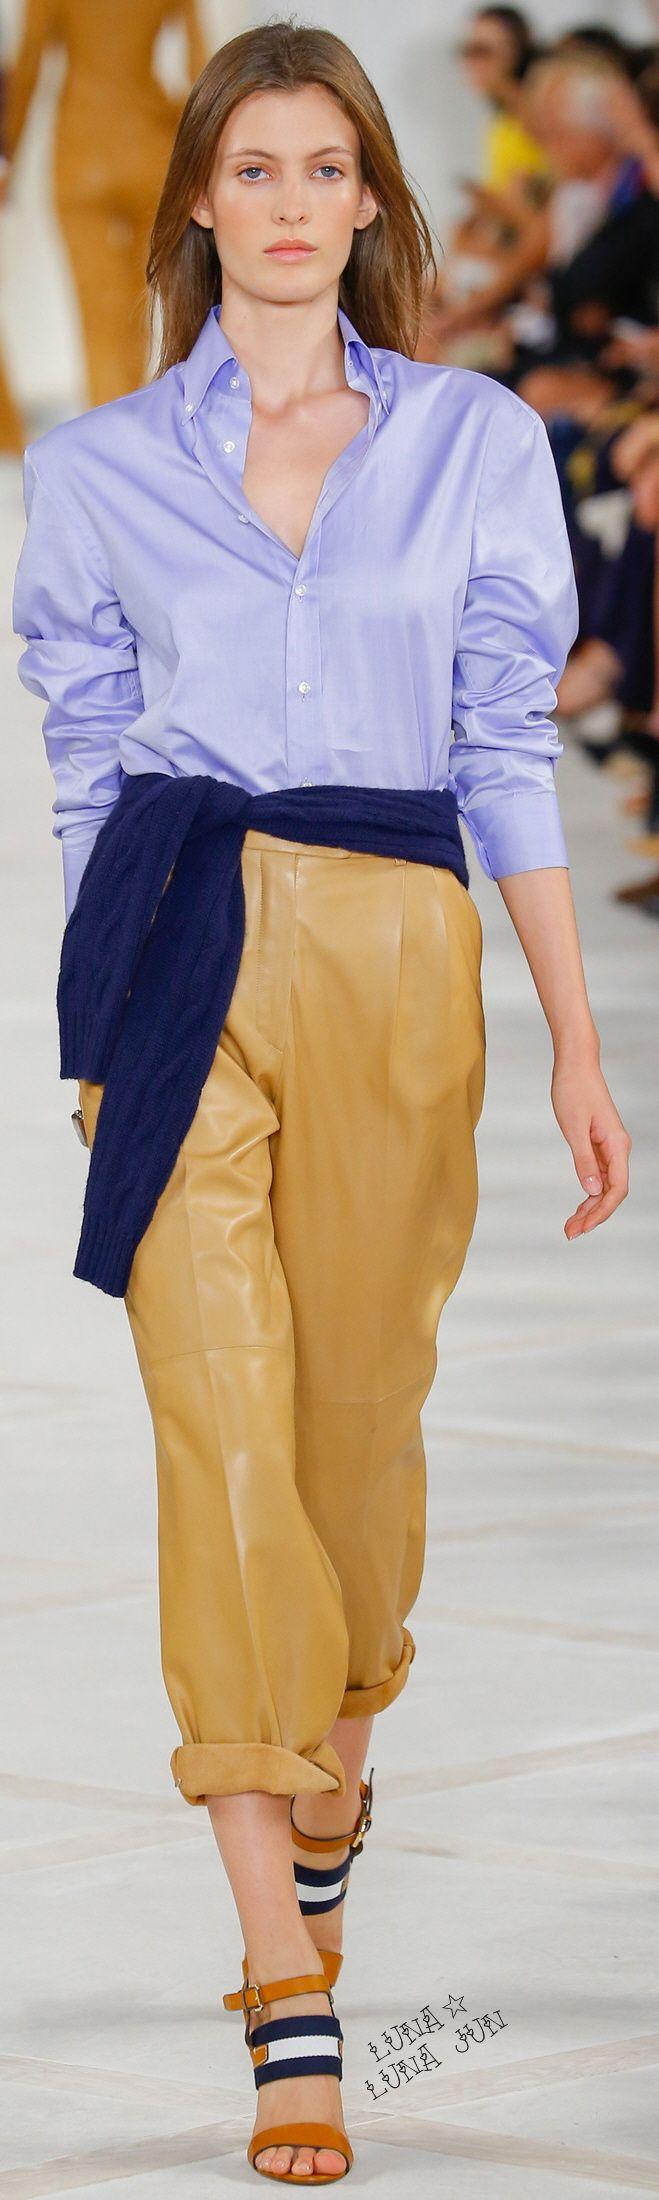 Ralph lauren spring 2016 ralph lauren pinterest Good style fashion show cleveland